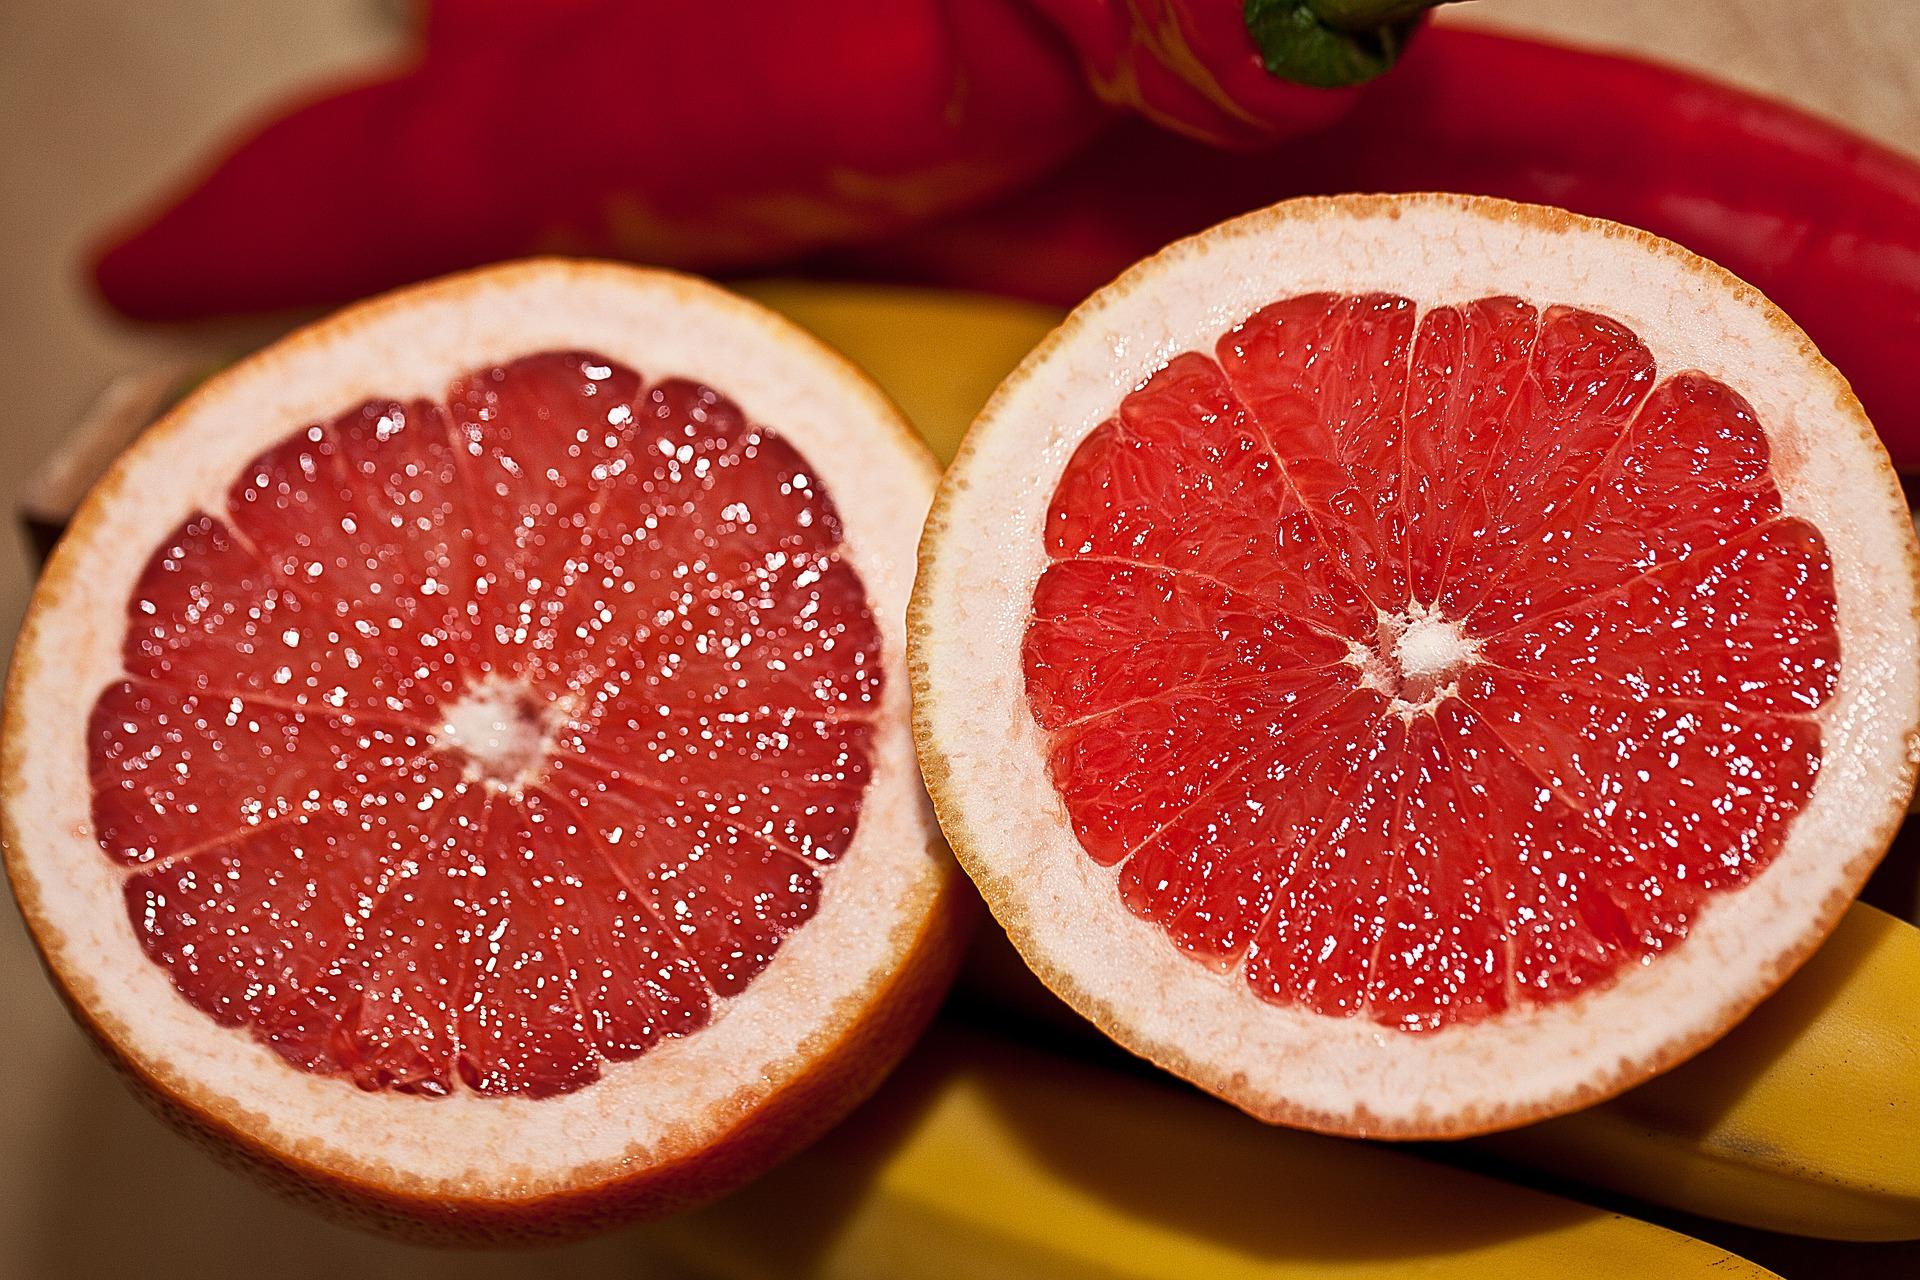 fruit 671980 1920